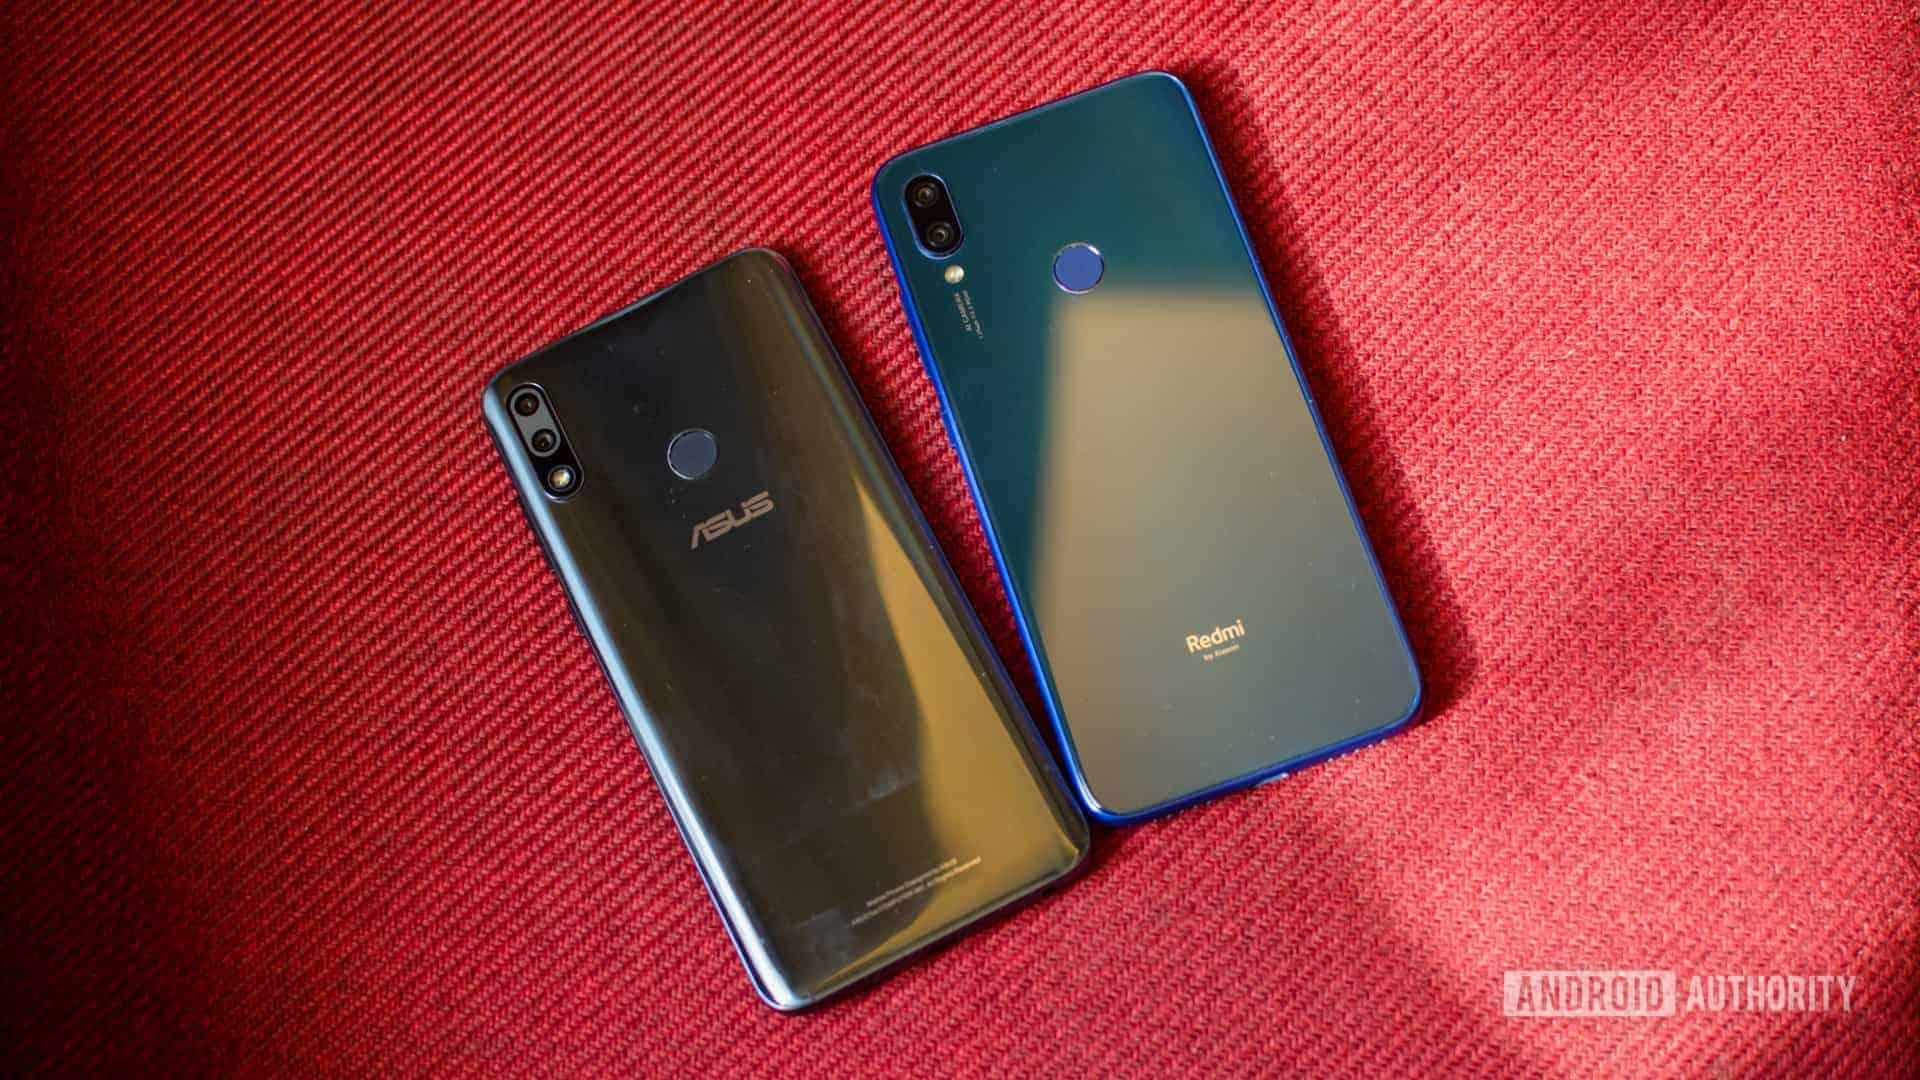 Redmi Note 7 vs Asus Zenfone Max Pro M2 back of the phone